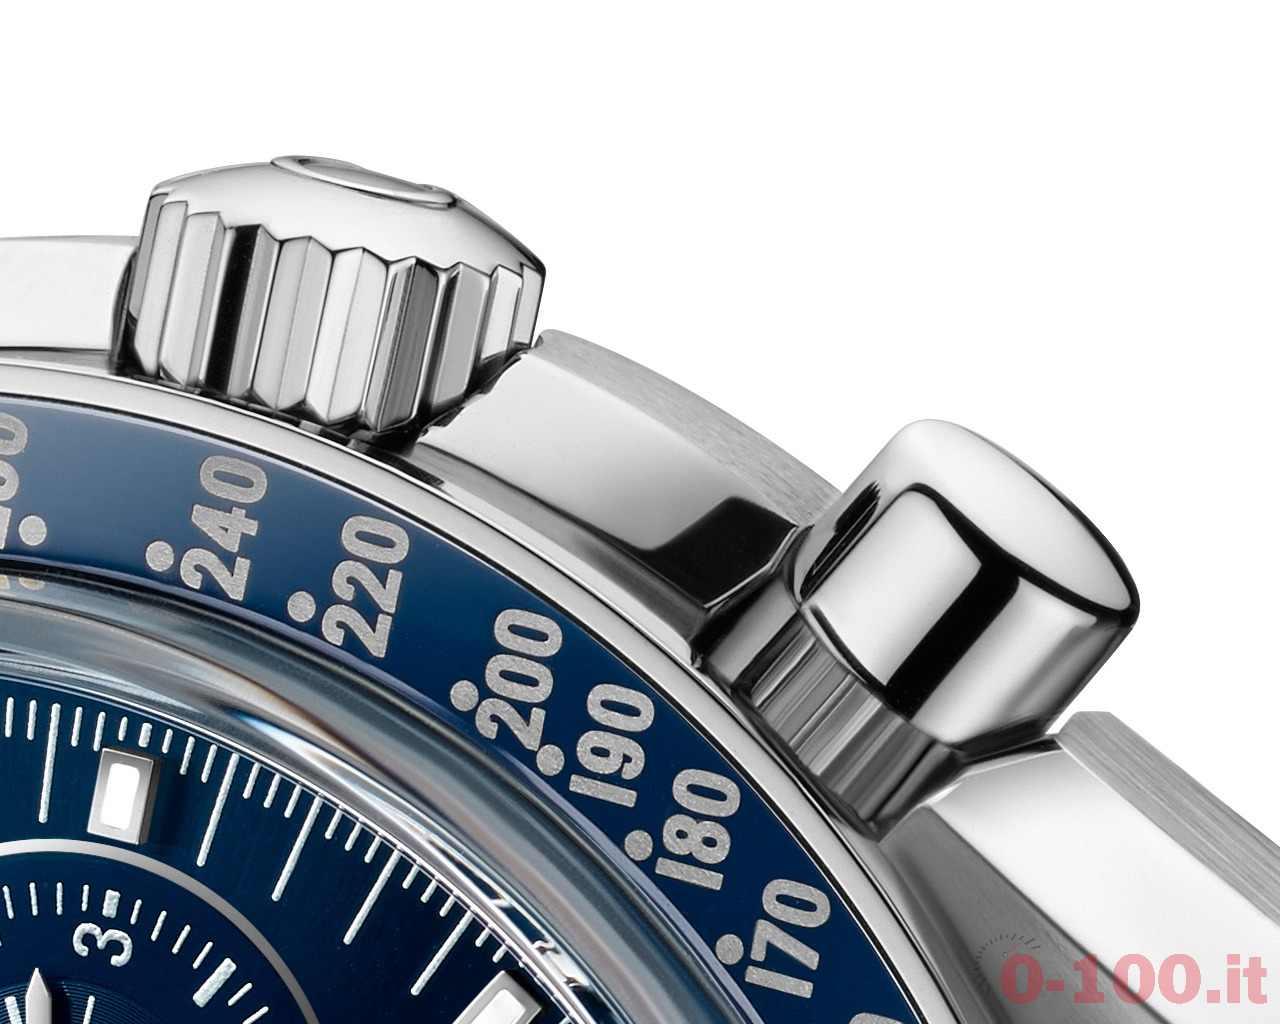 baselworld-2016-omega-speedmaster-moonphase-master-chronometer-ref-304-33-44-52-03-001_0-1006